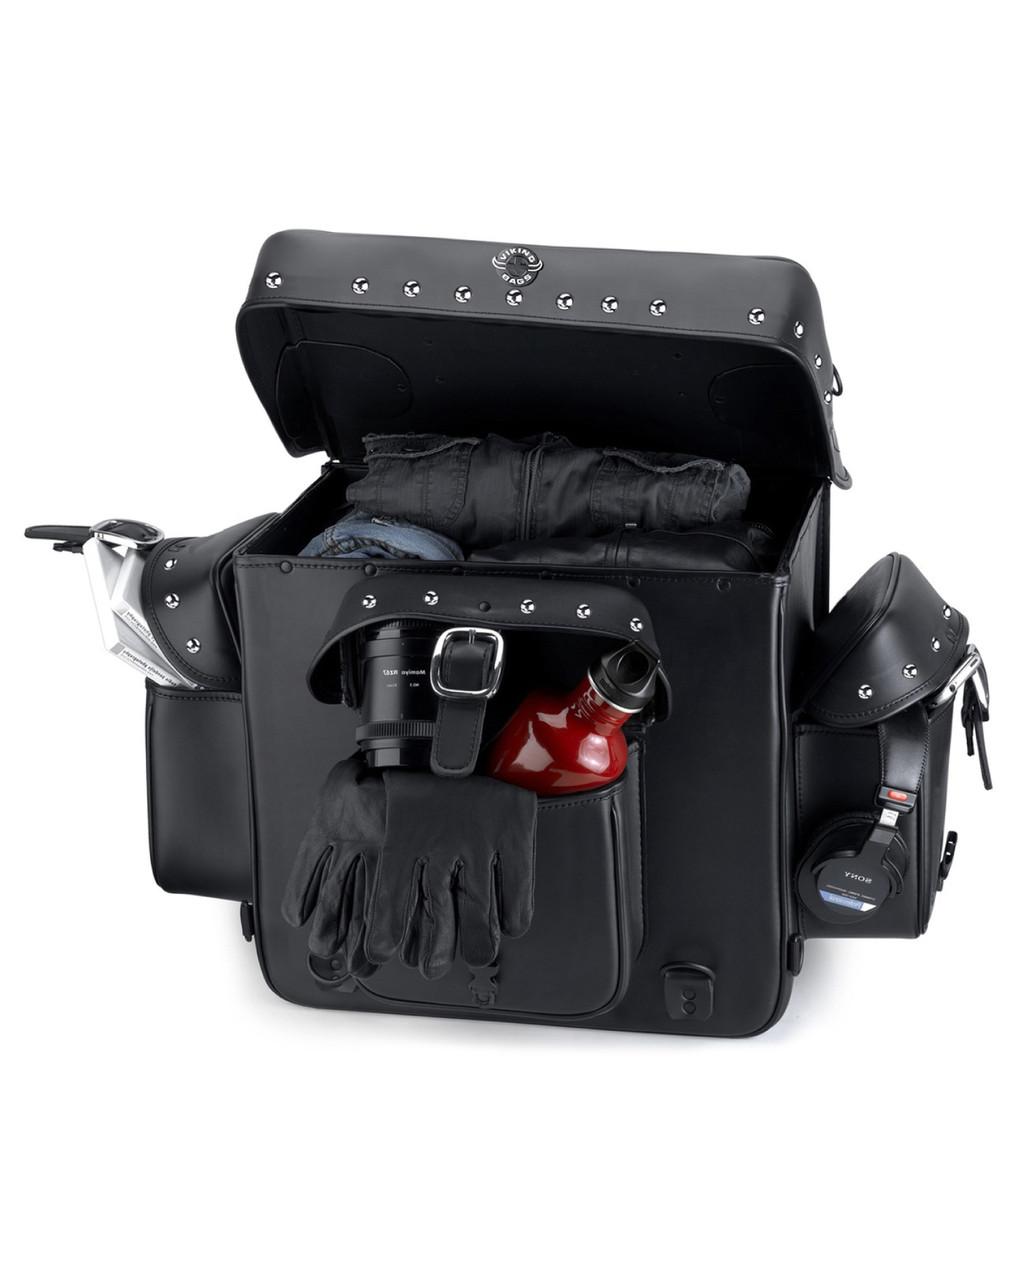 Viking Revival Series Studded Motorcycle Sissy Bar Bag For Harley Davidson Storage View